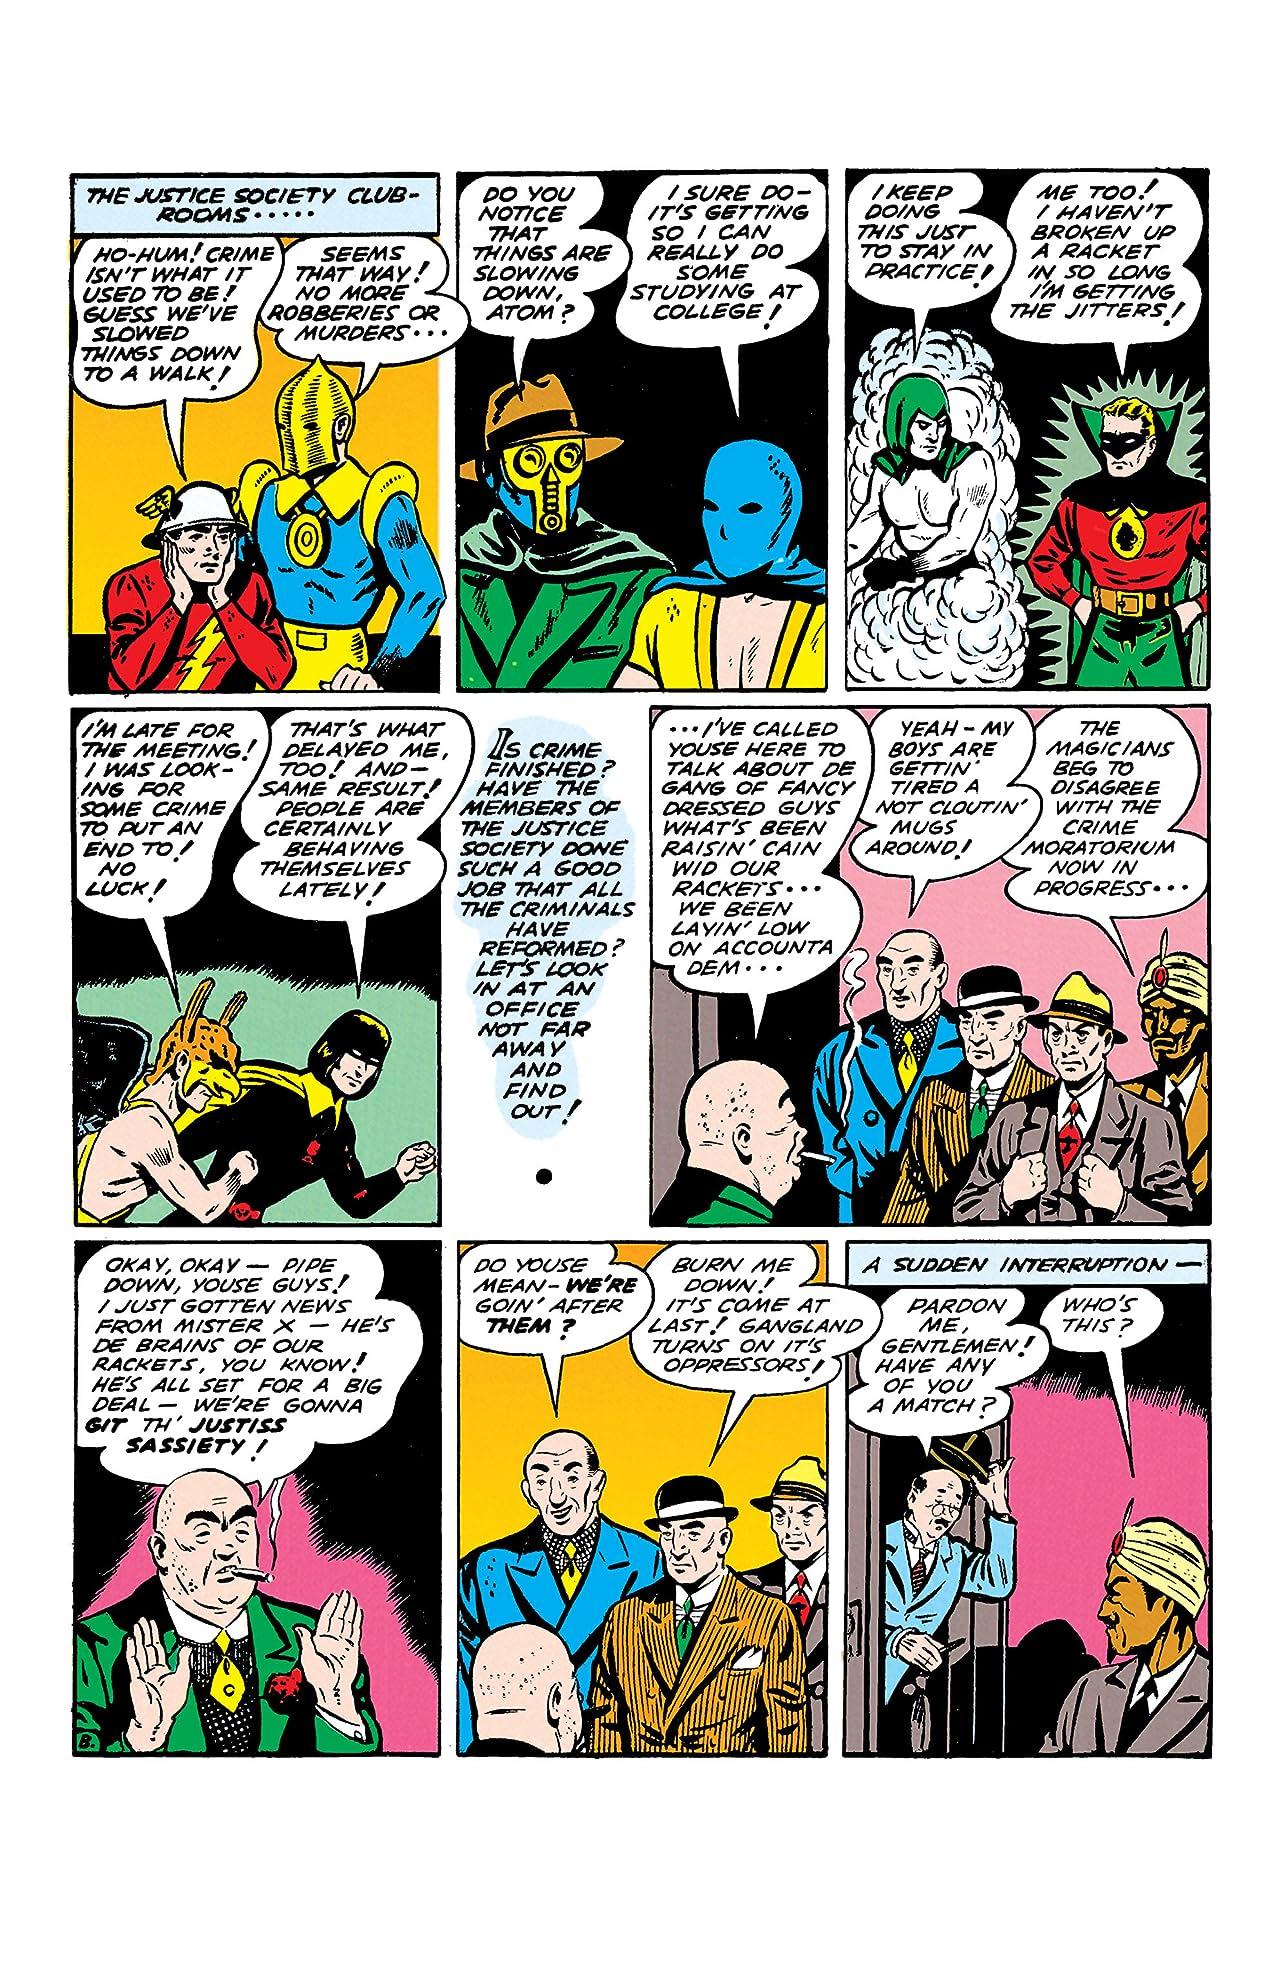 All-Star Comics #5